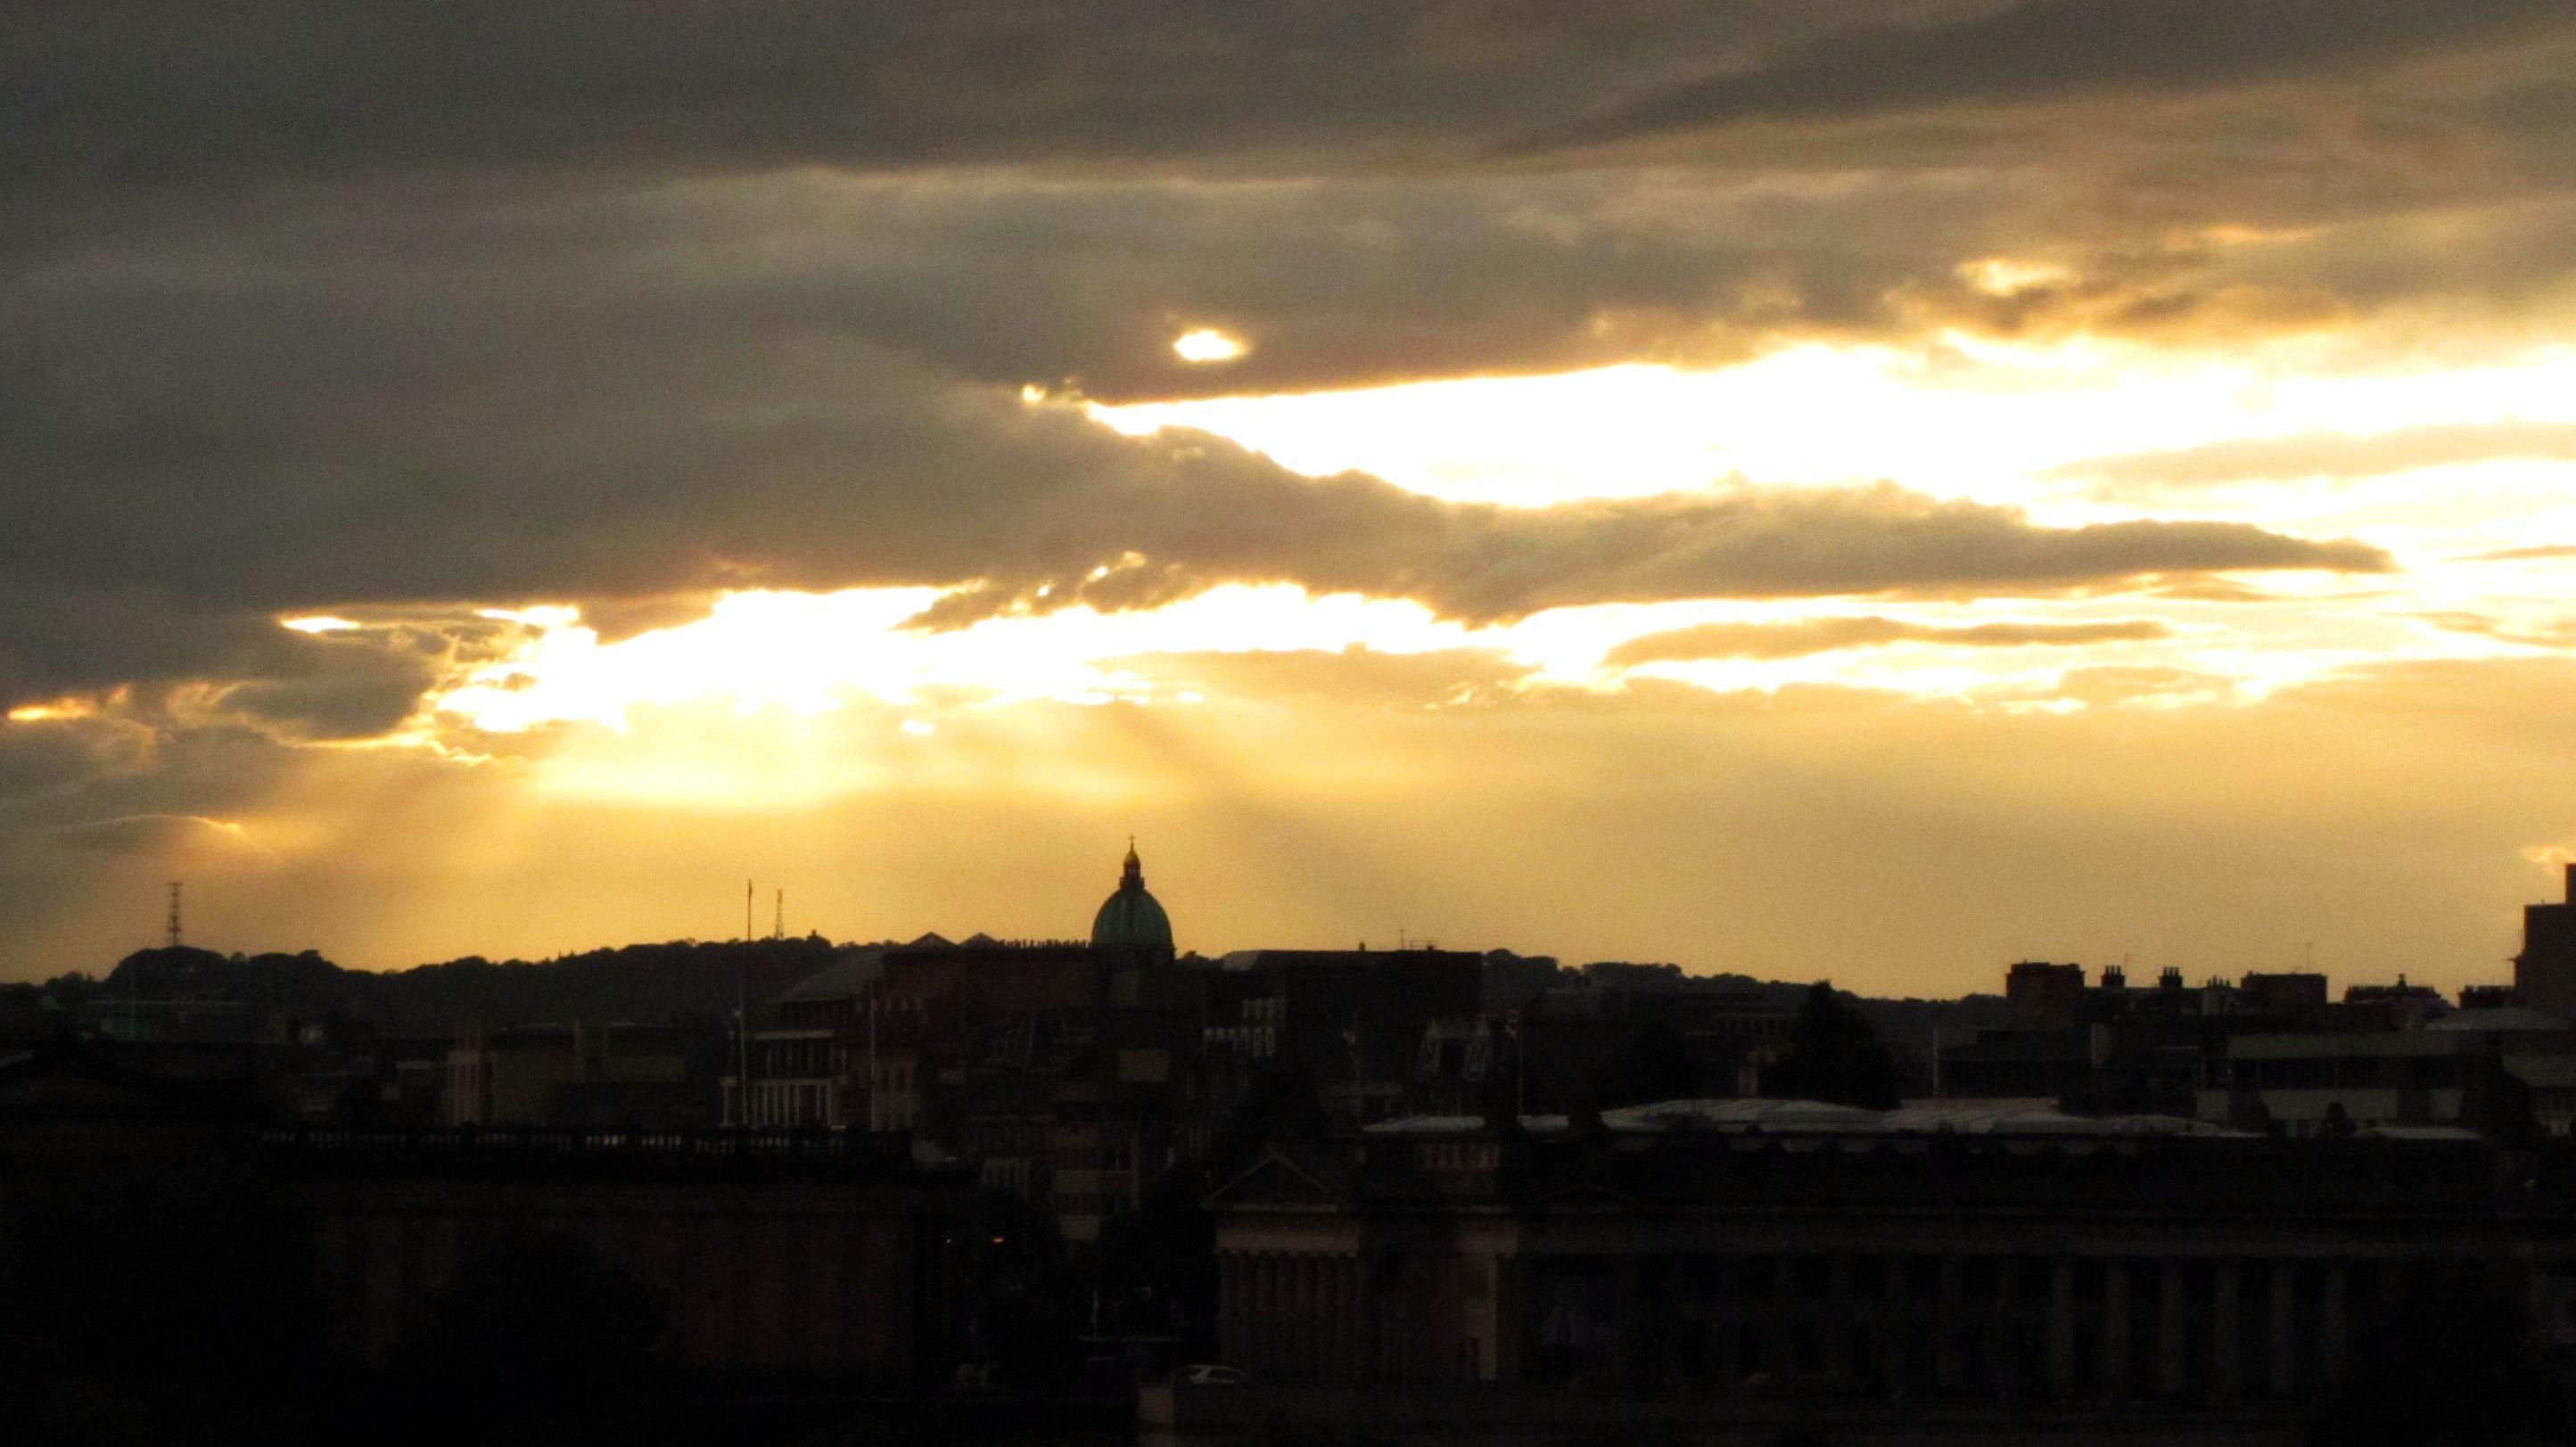 Edinburgh at sunset (shot by Marina Ferro)